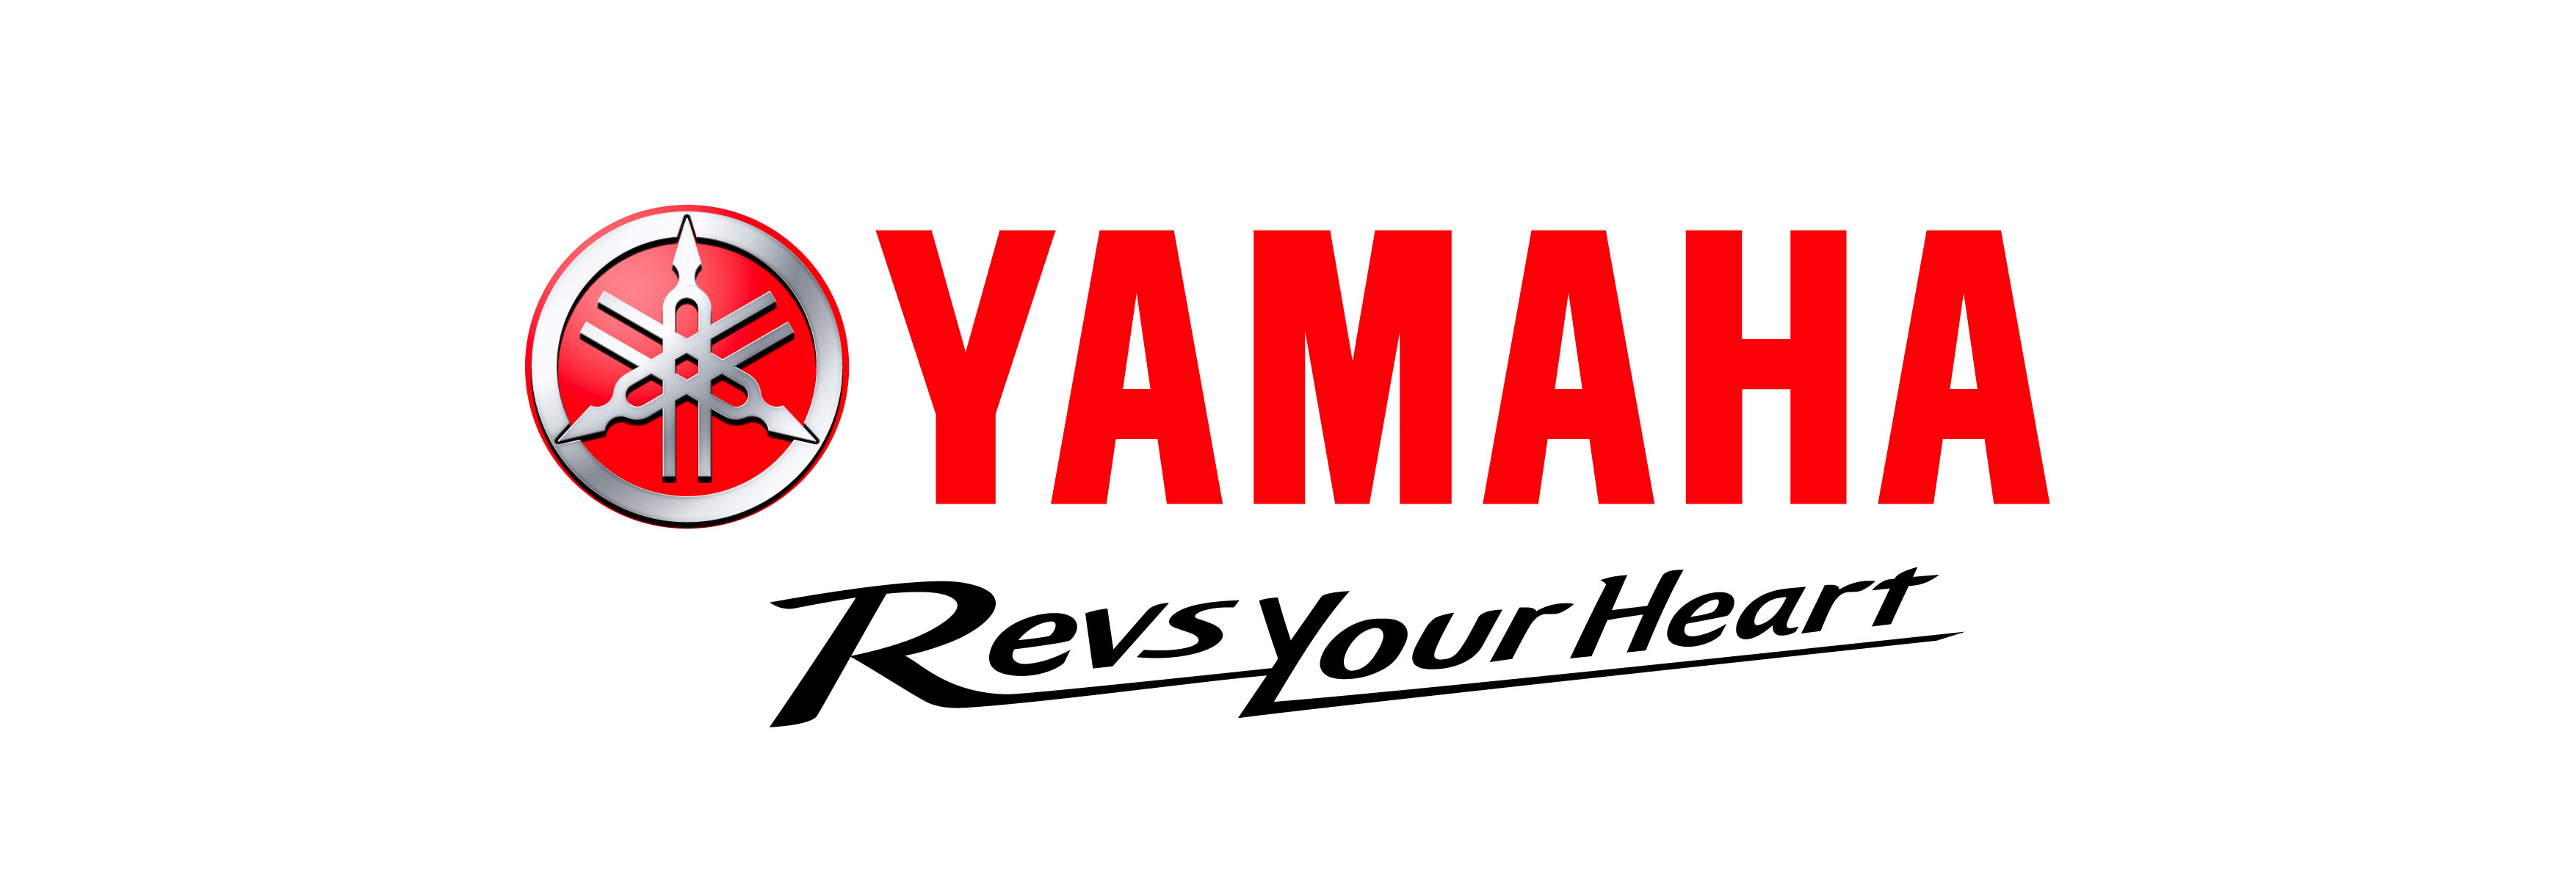 Yamaha Roller Zubehör